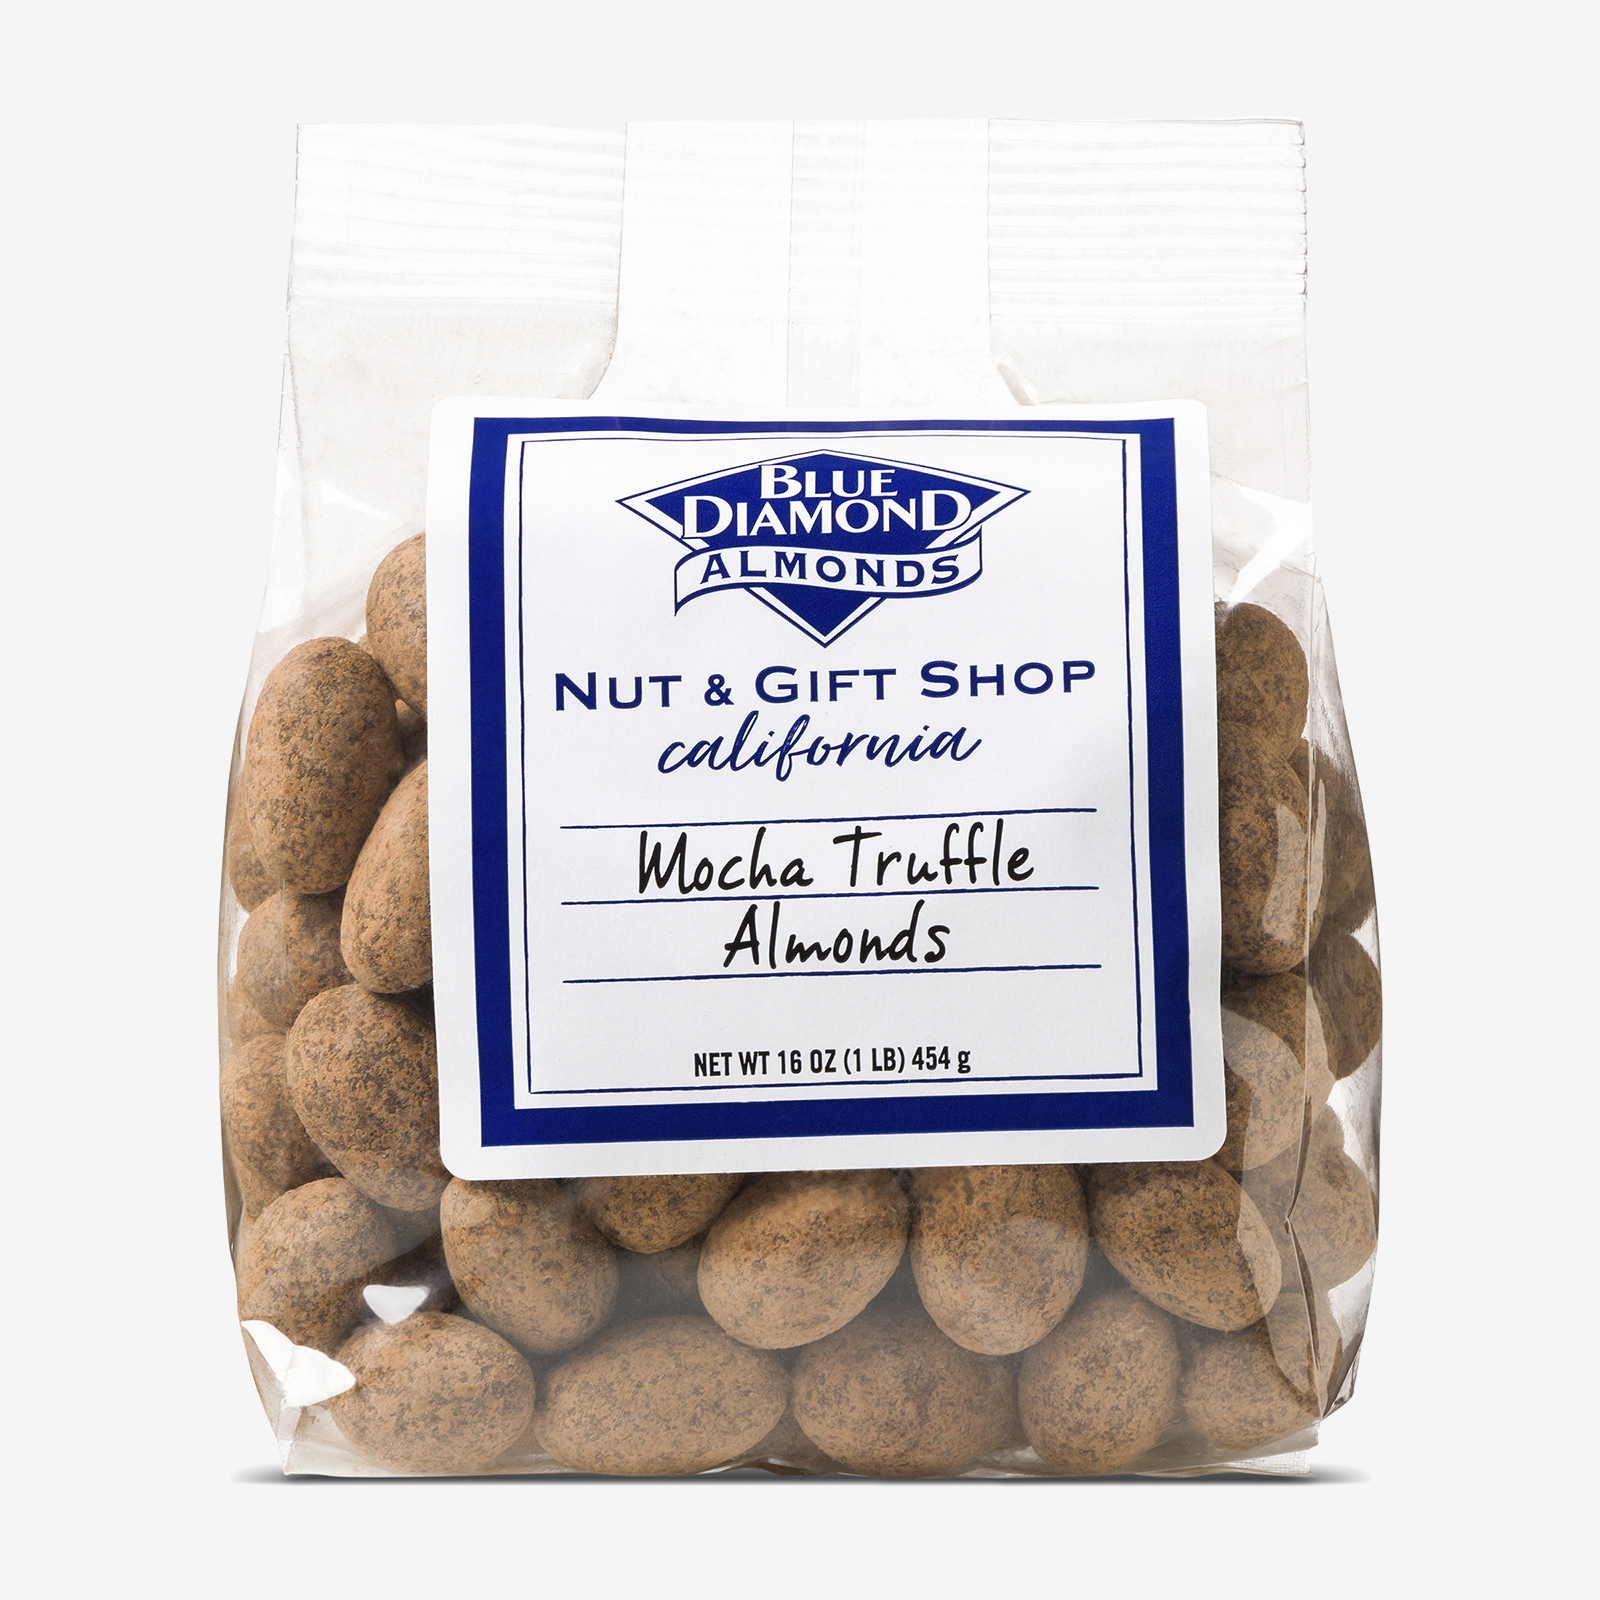 Truffle almonds product image